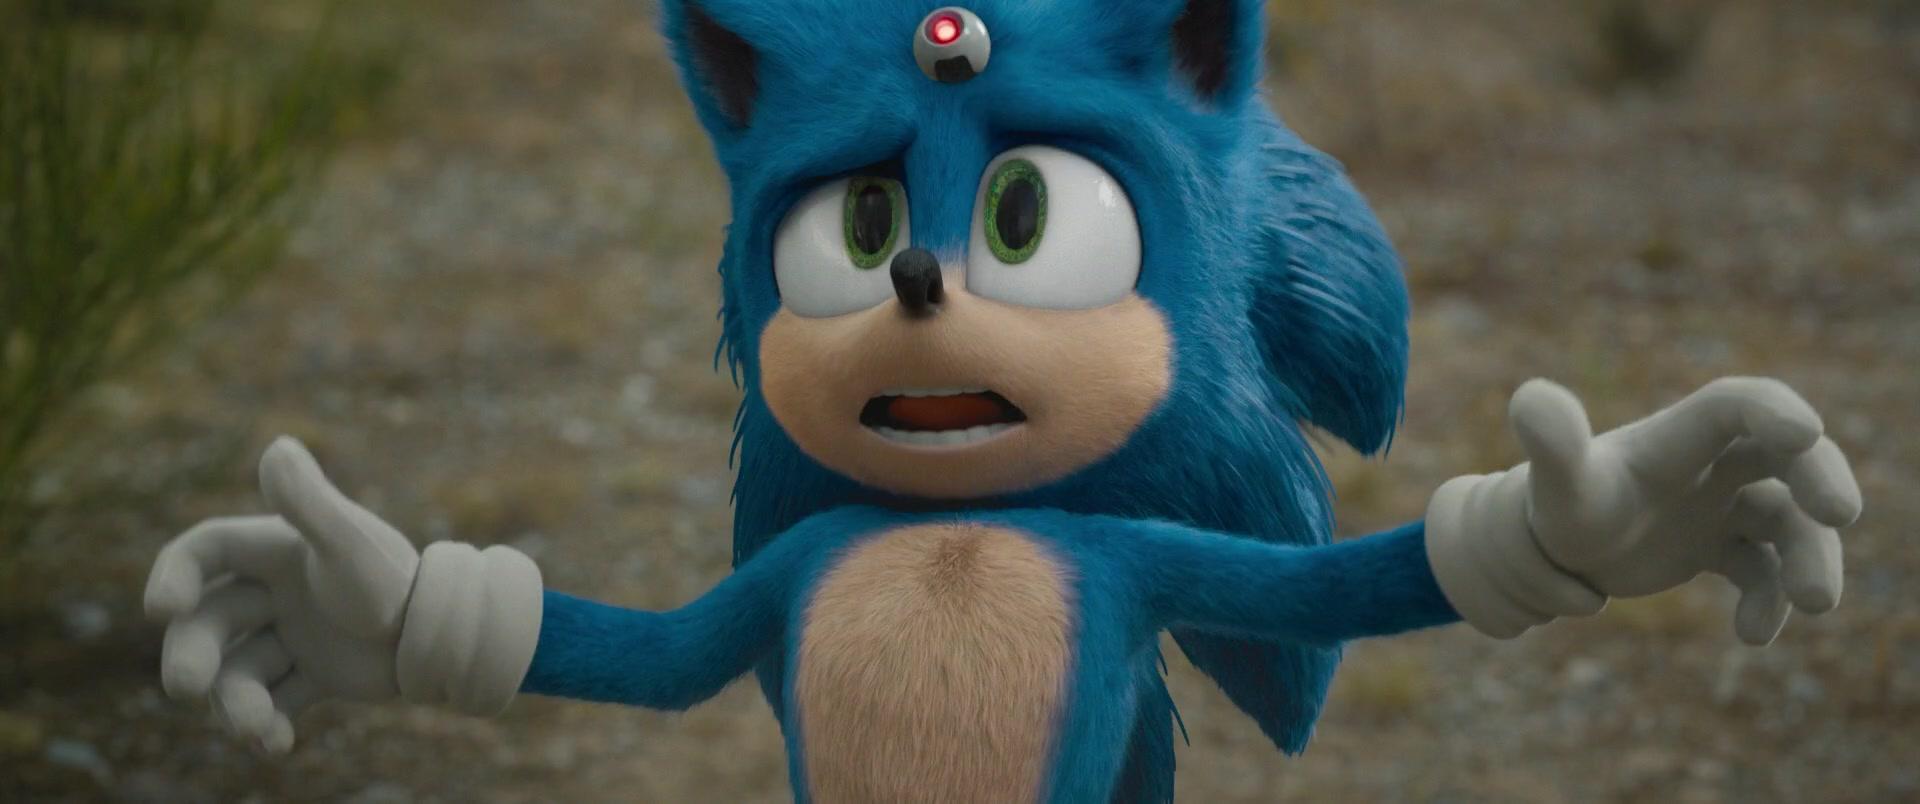 Sonic The Hedgehog 2020 1080p WEB-DL H264 AC3-EVO